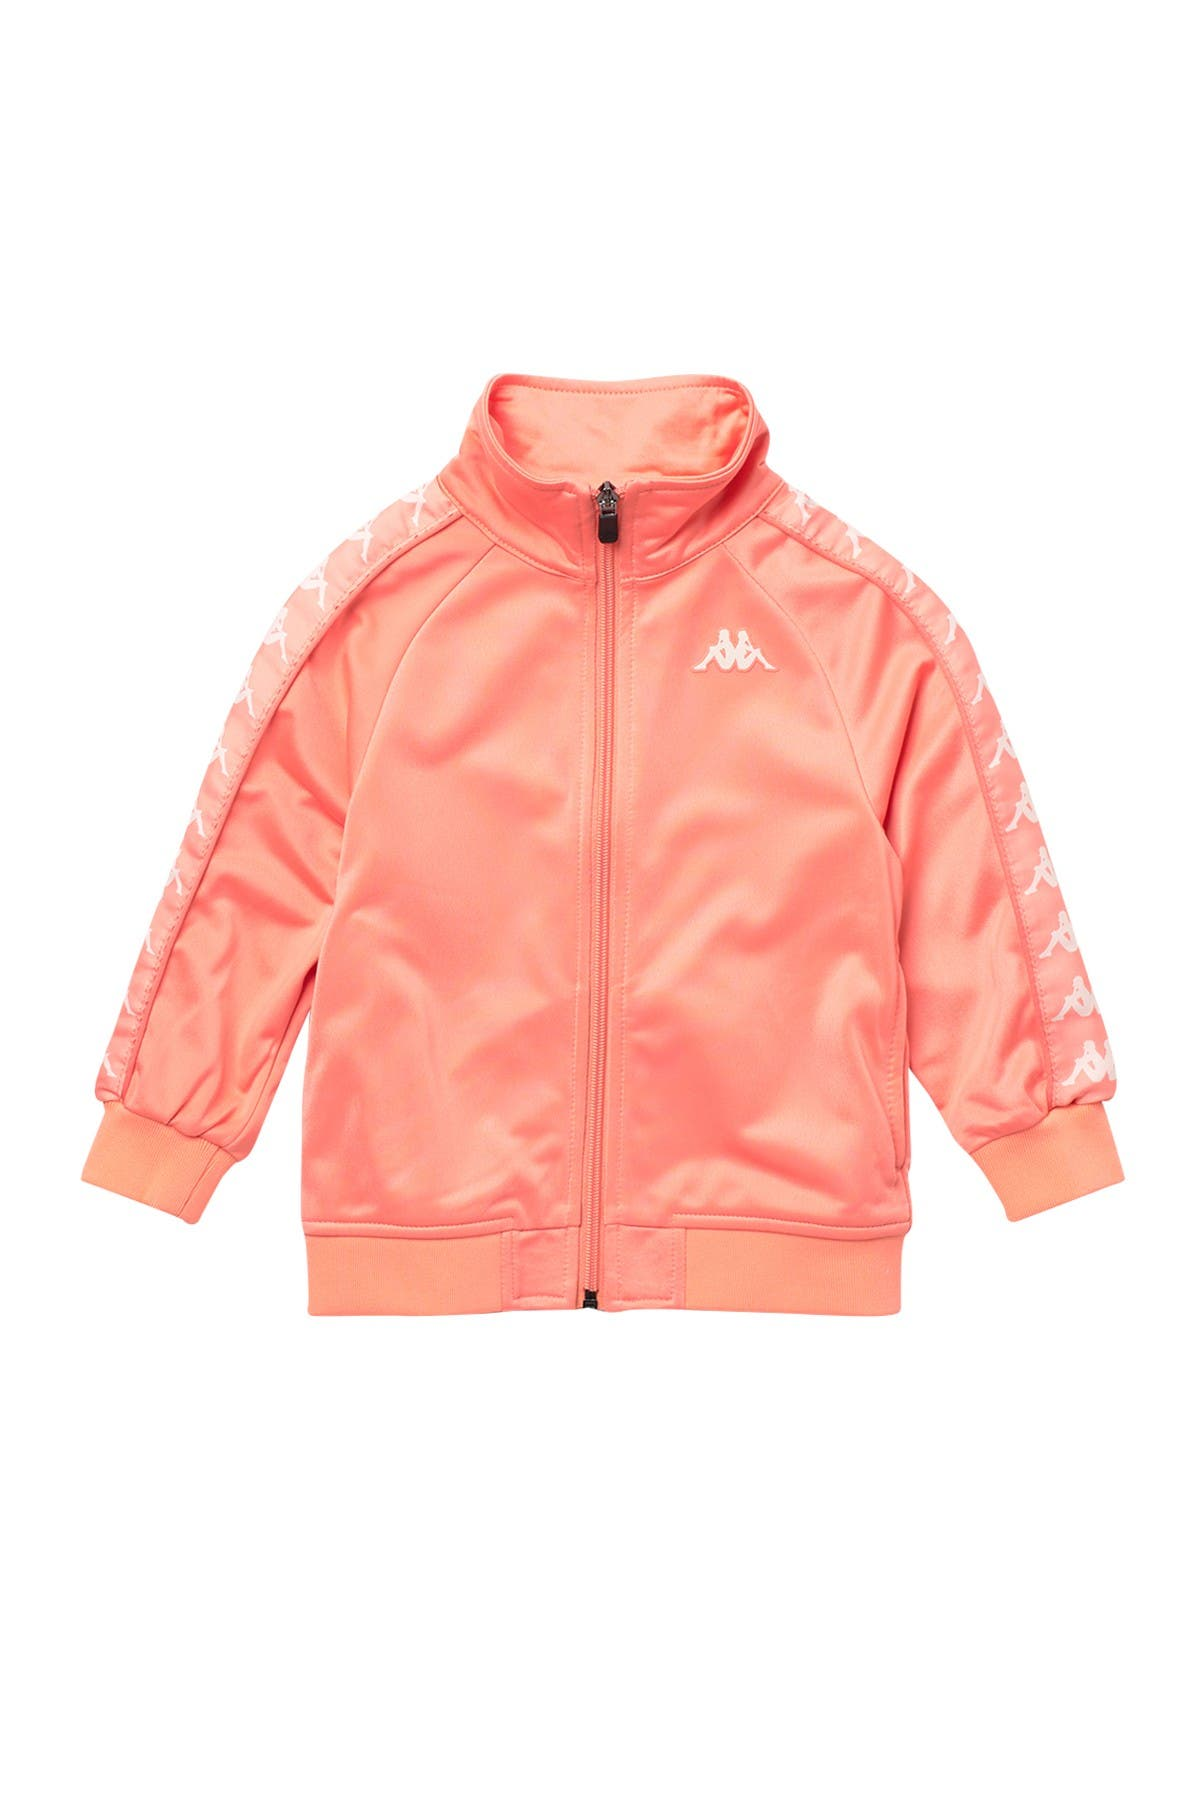 Image of Kappa Active Banda Anniston Jacket